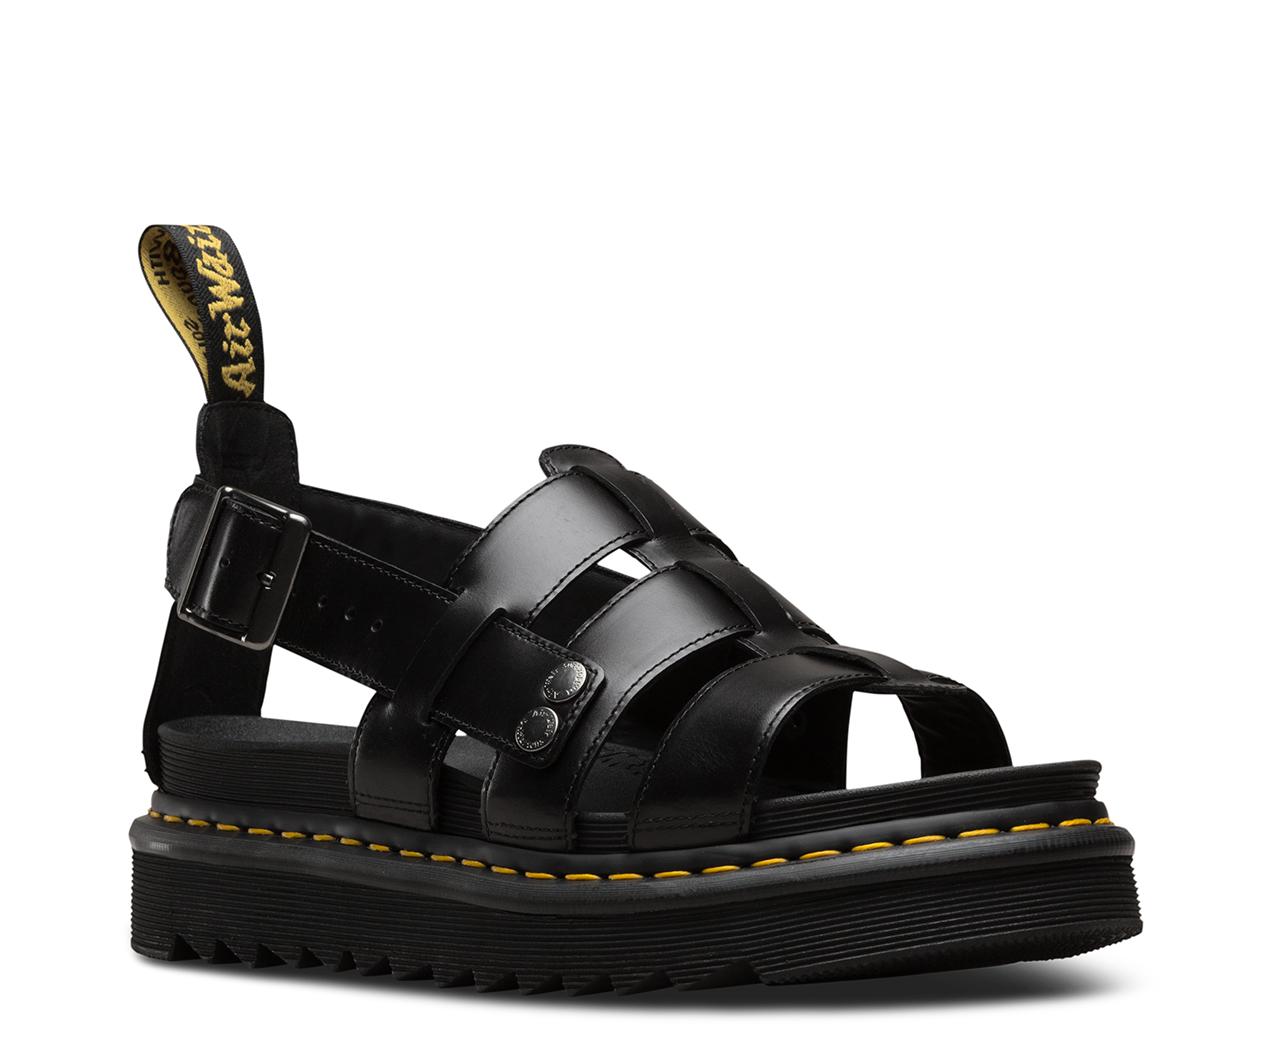 TERRY | Men's Sandals | Official Dr. Martens Store - UK